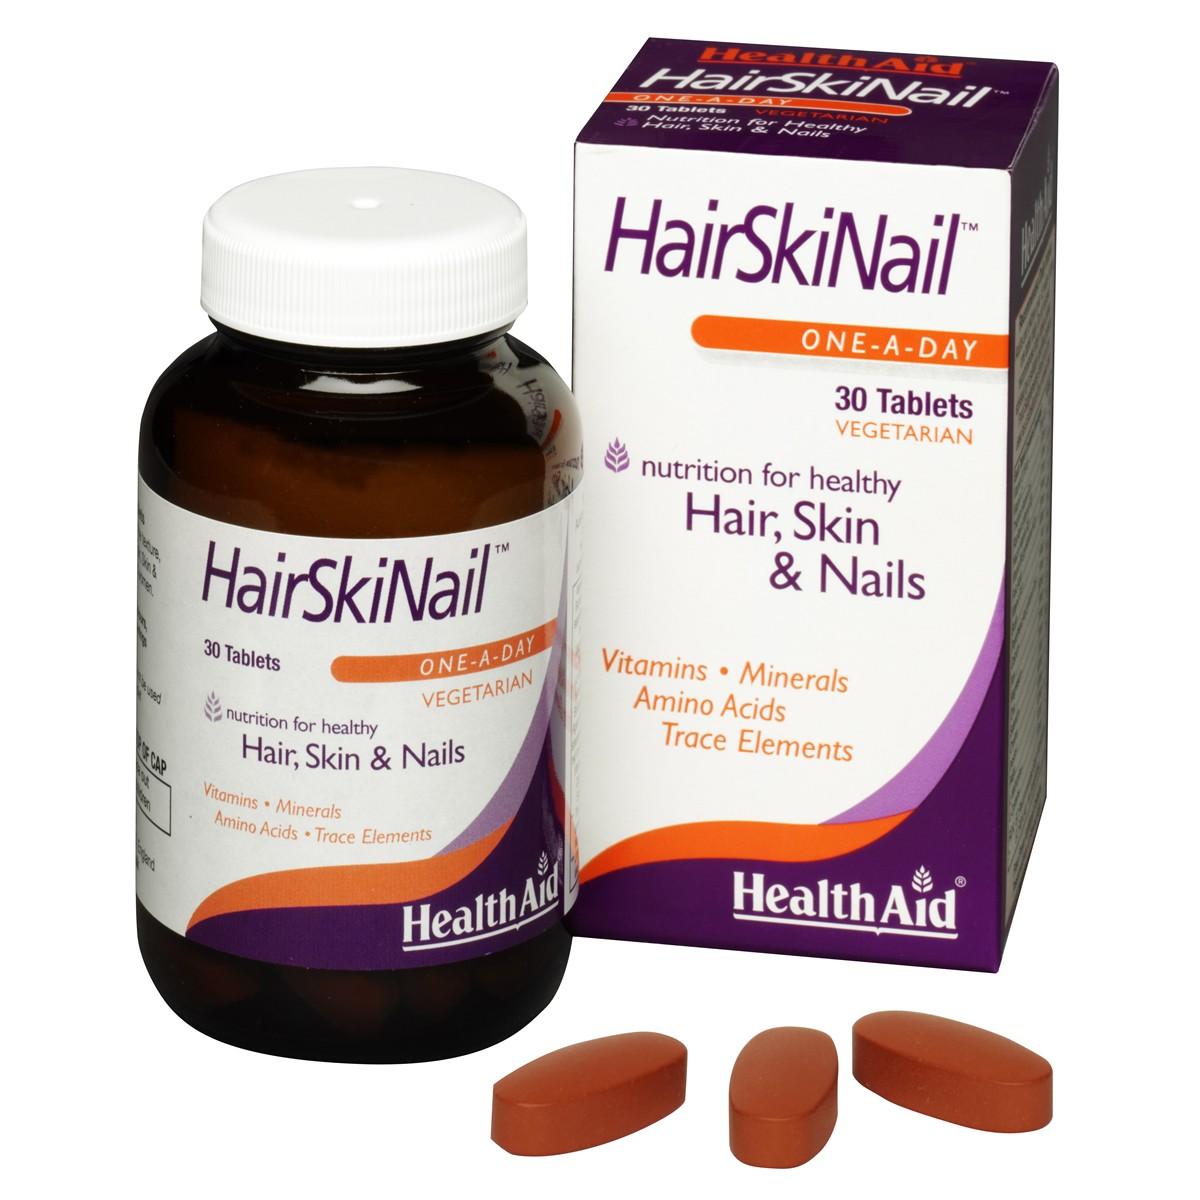 HealthAid Hair, Skin & Nail Formula